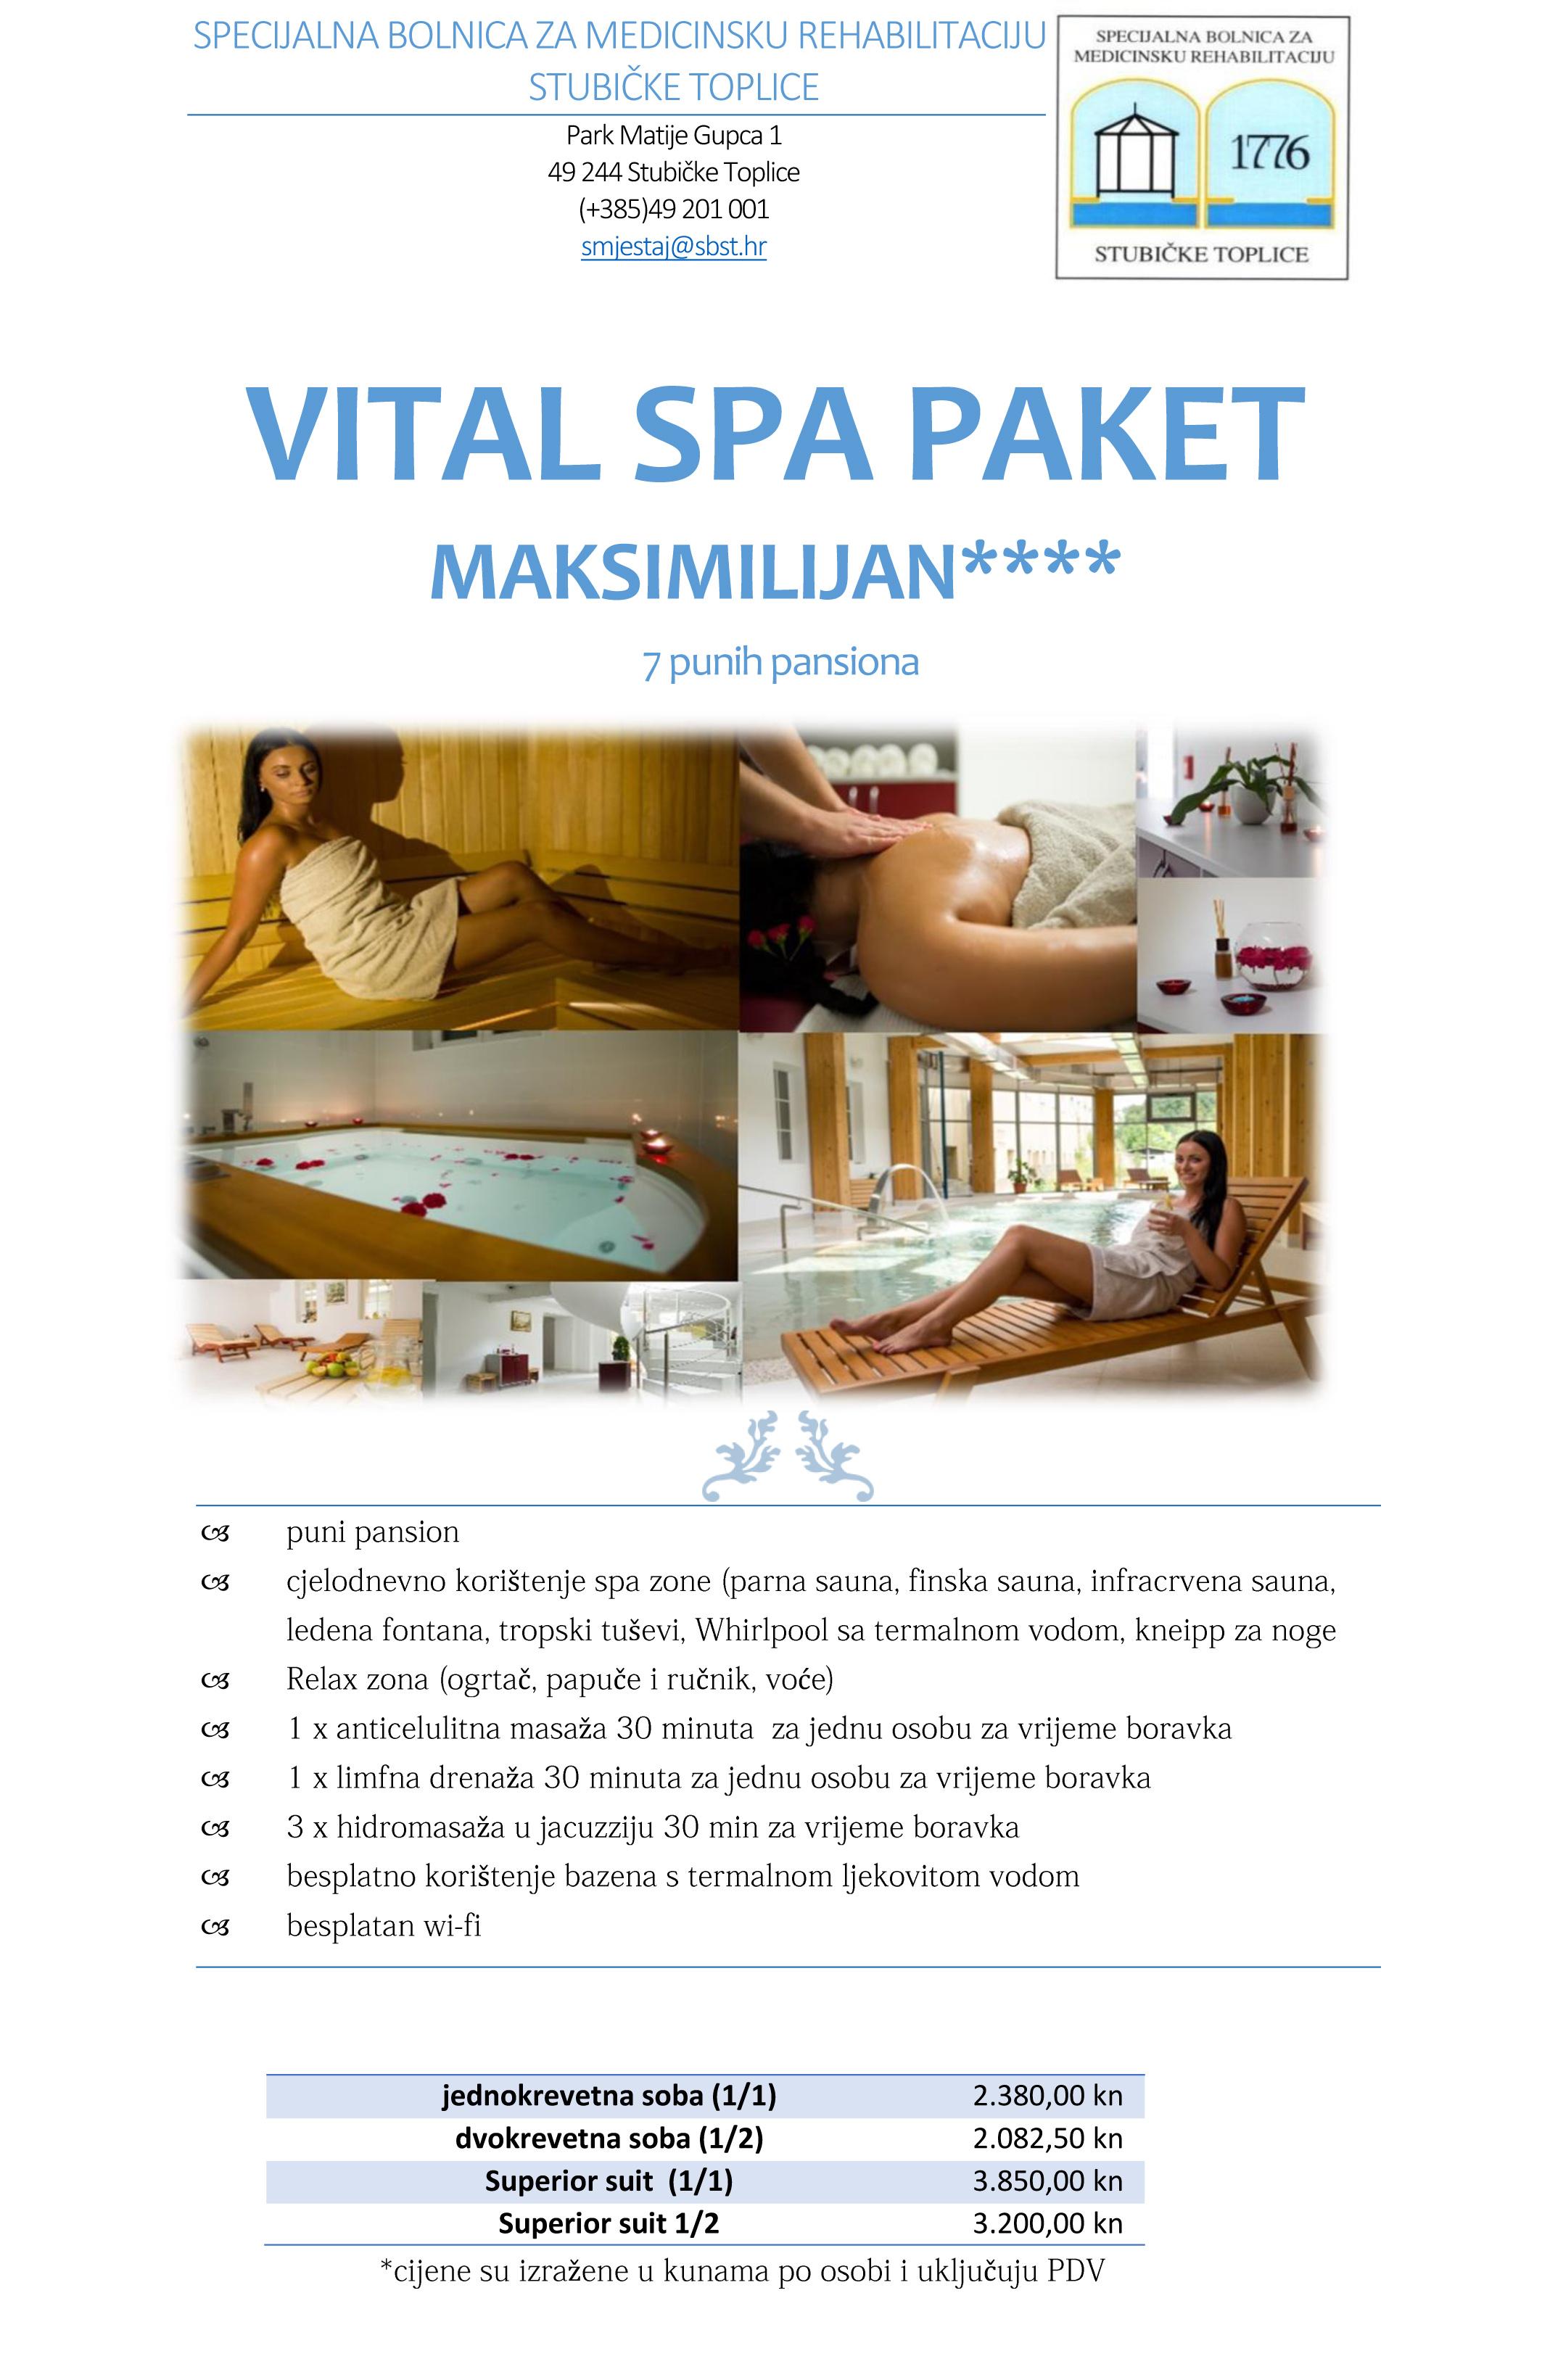 Vital_Spa_paket_Maksimilijan